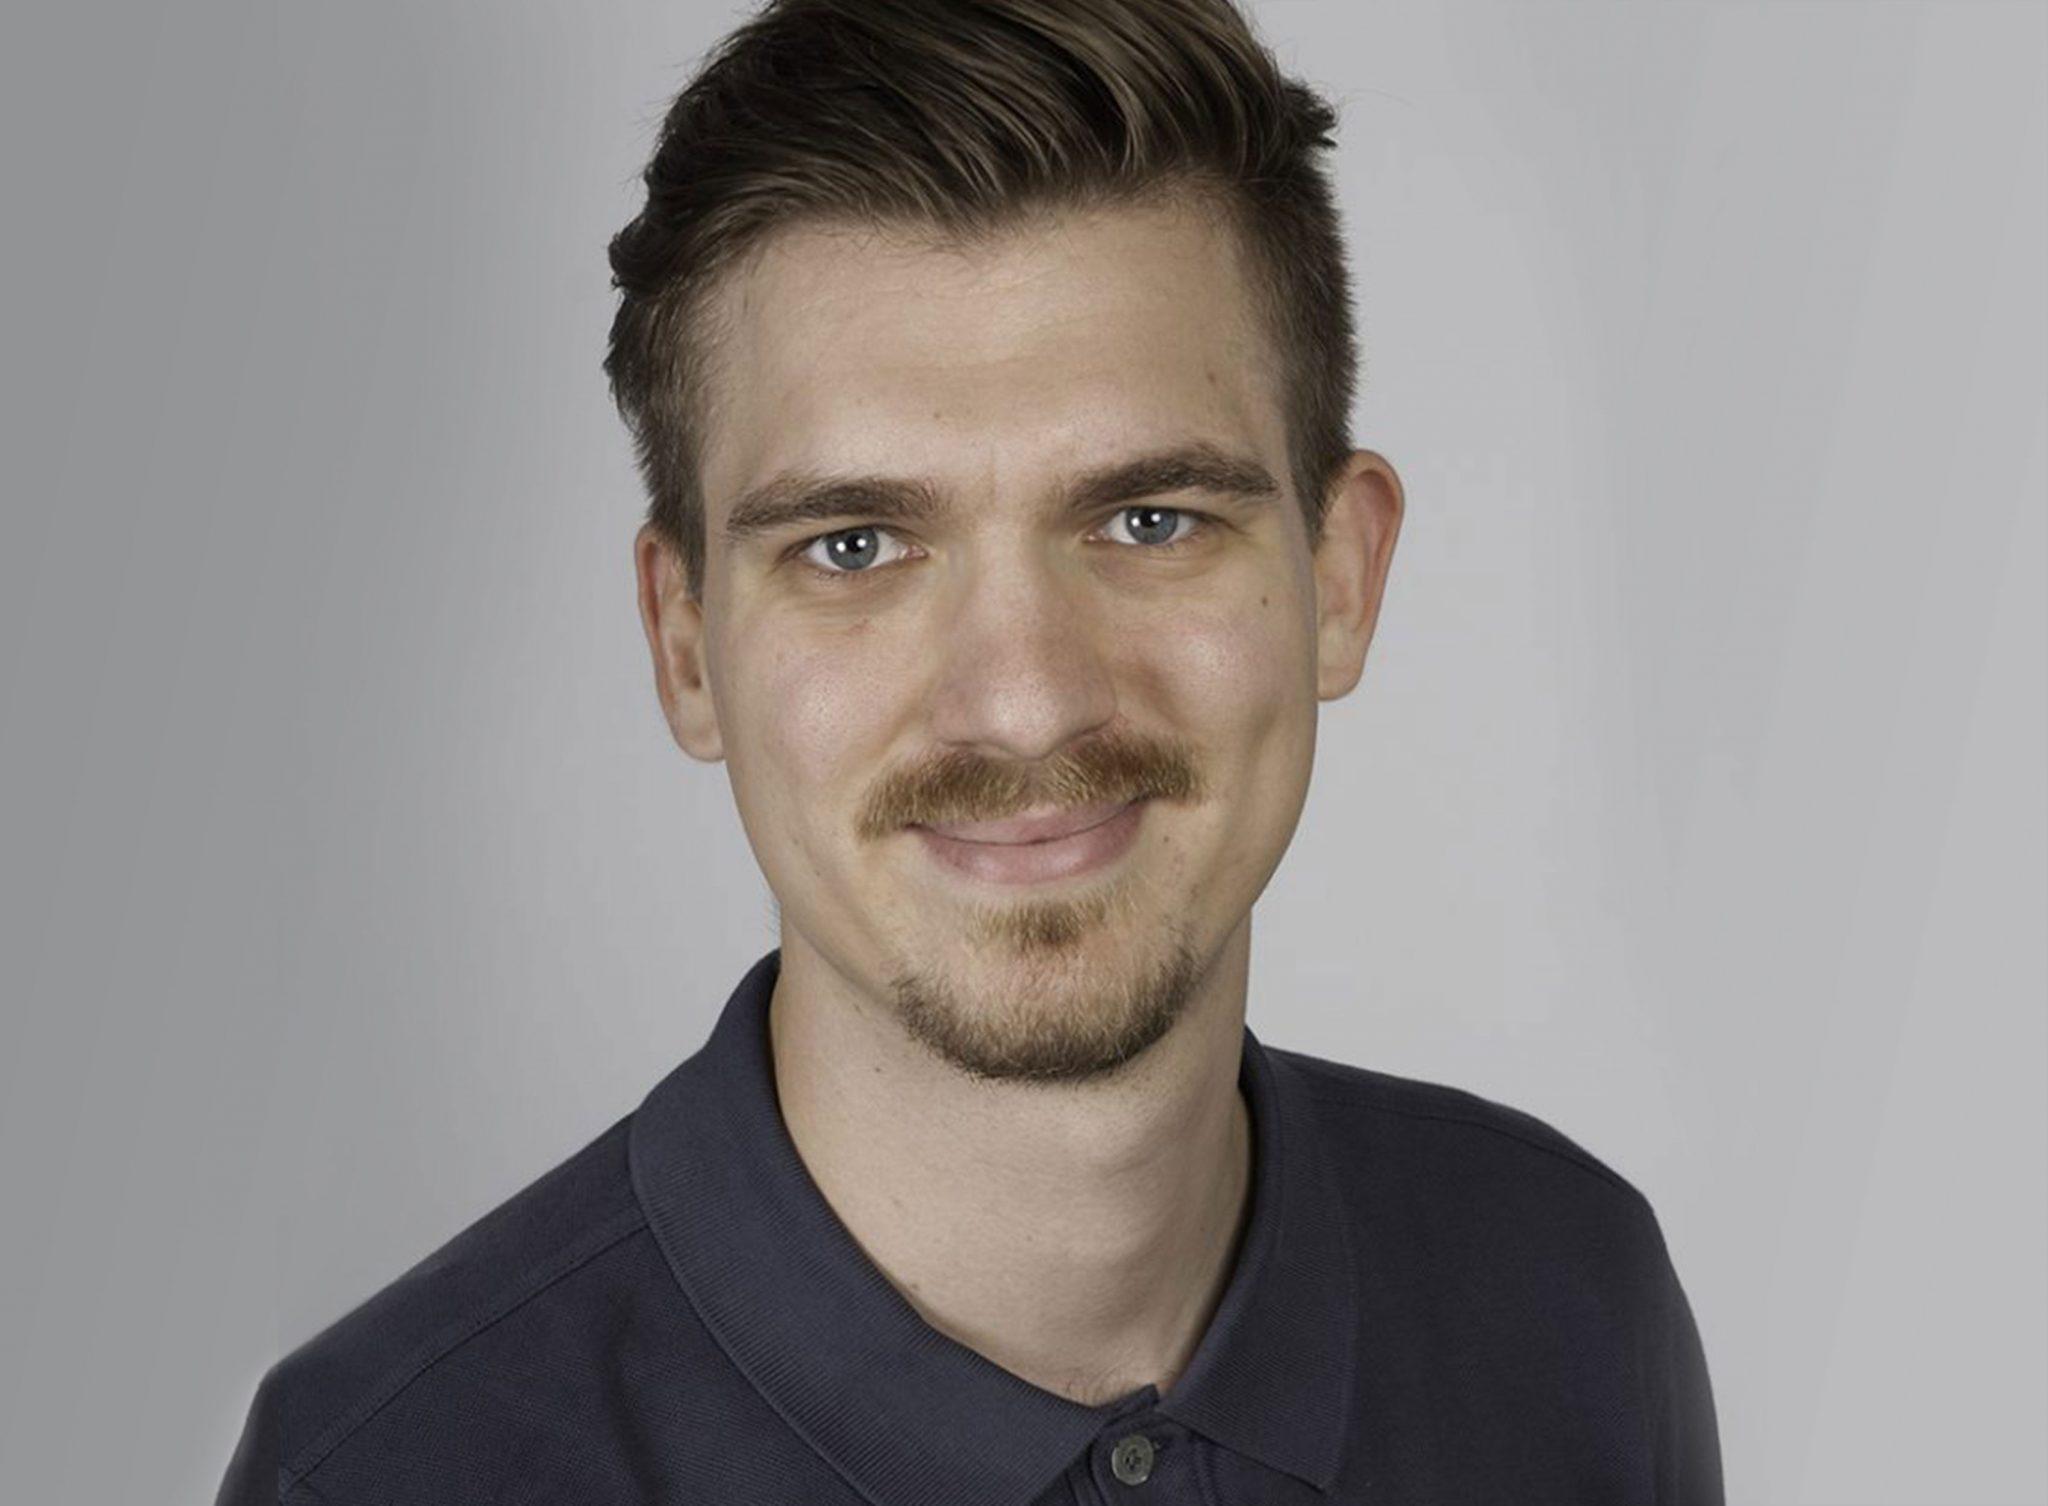 Felix Holstein